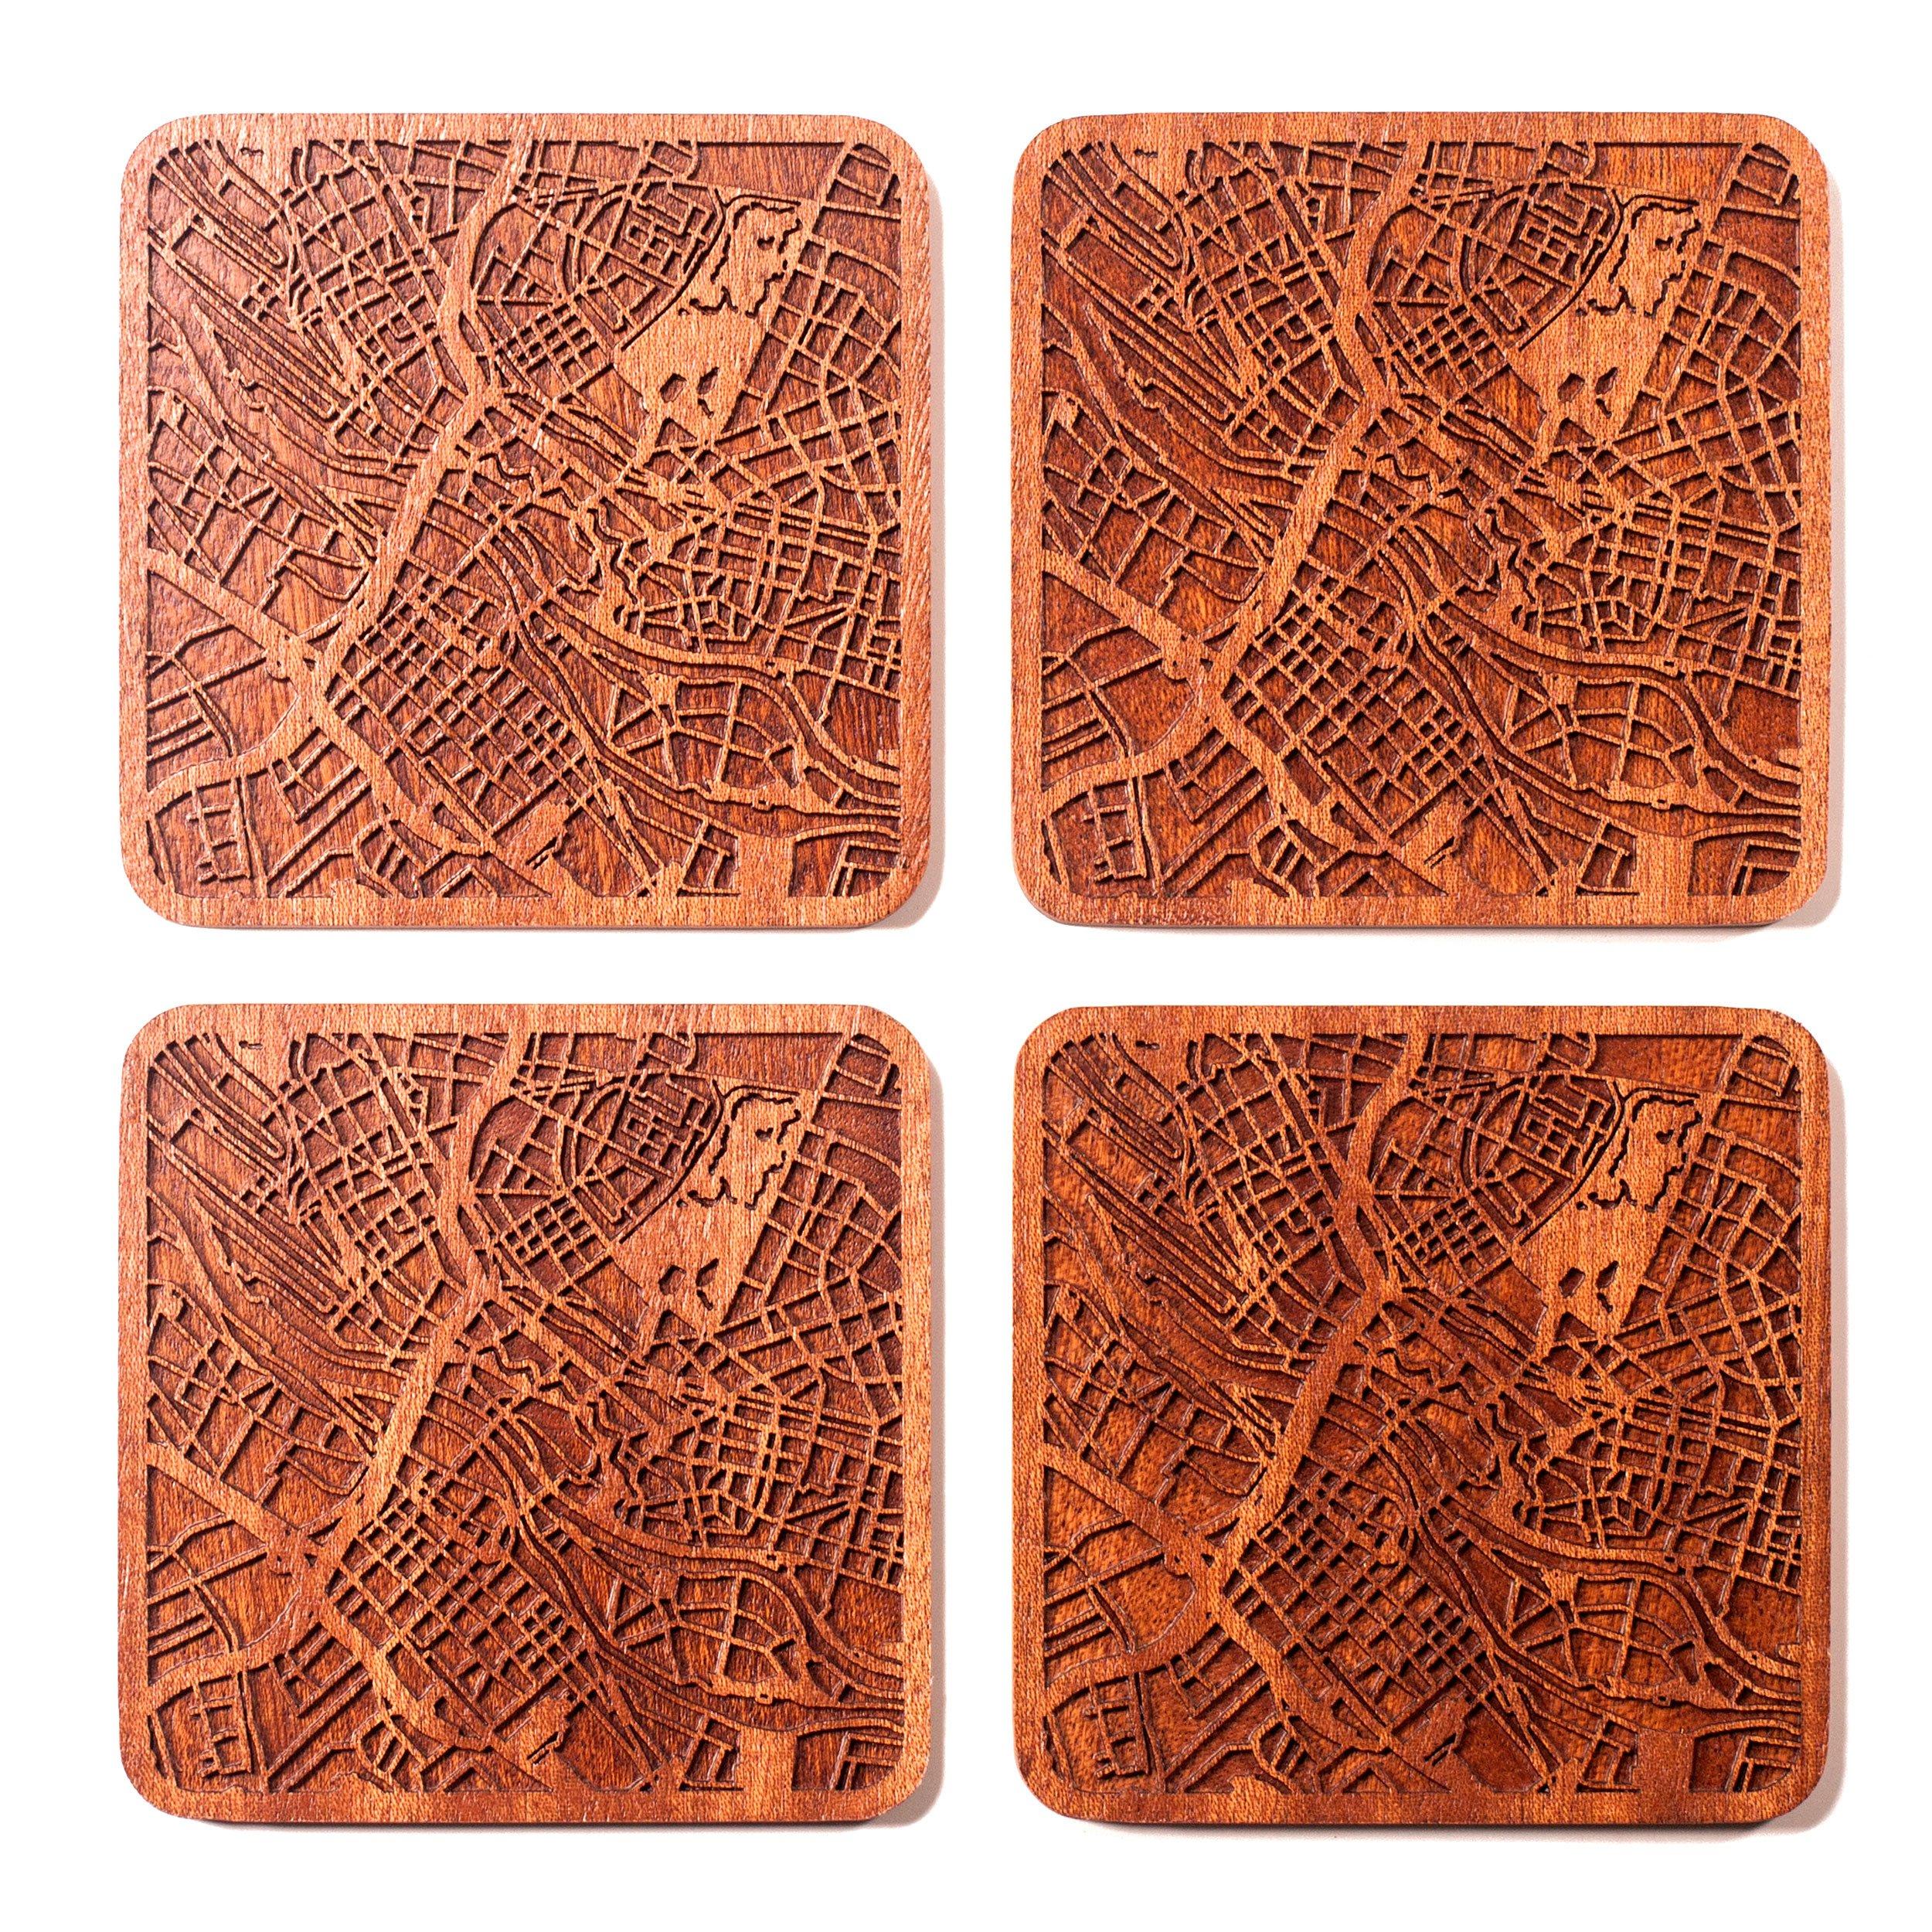 Bremen Map Coaster by O3 Design Studio, Set Of